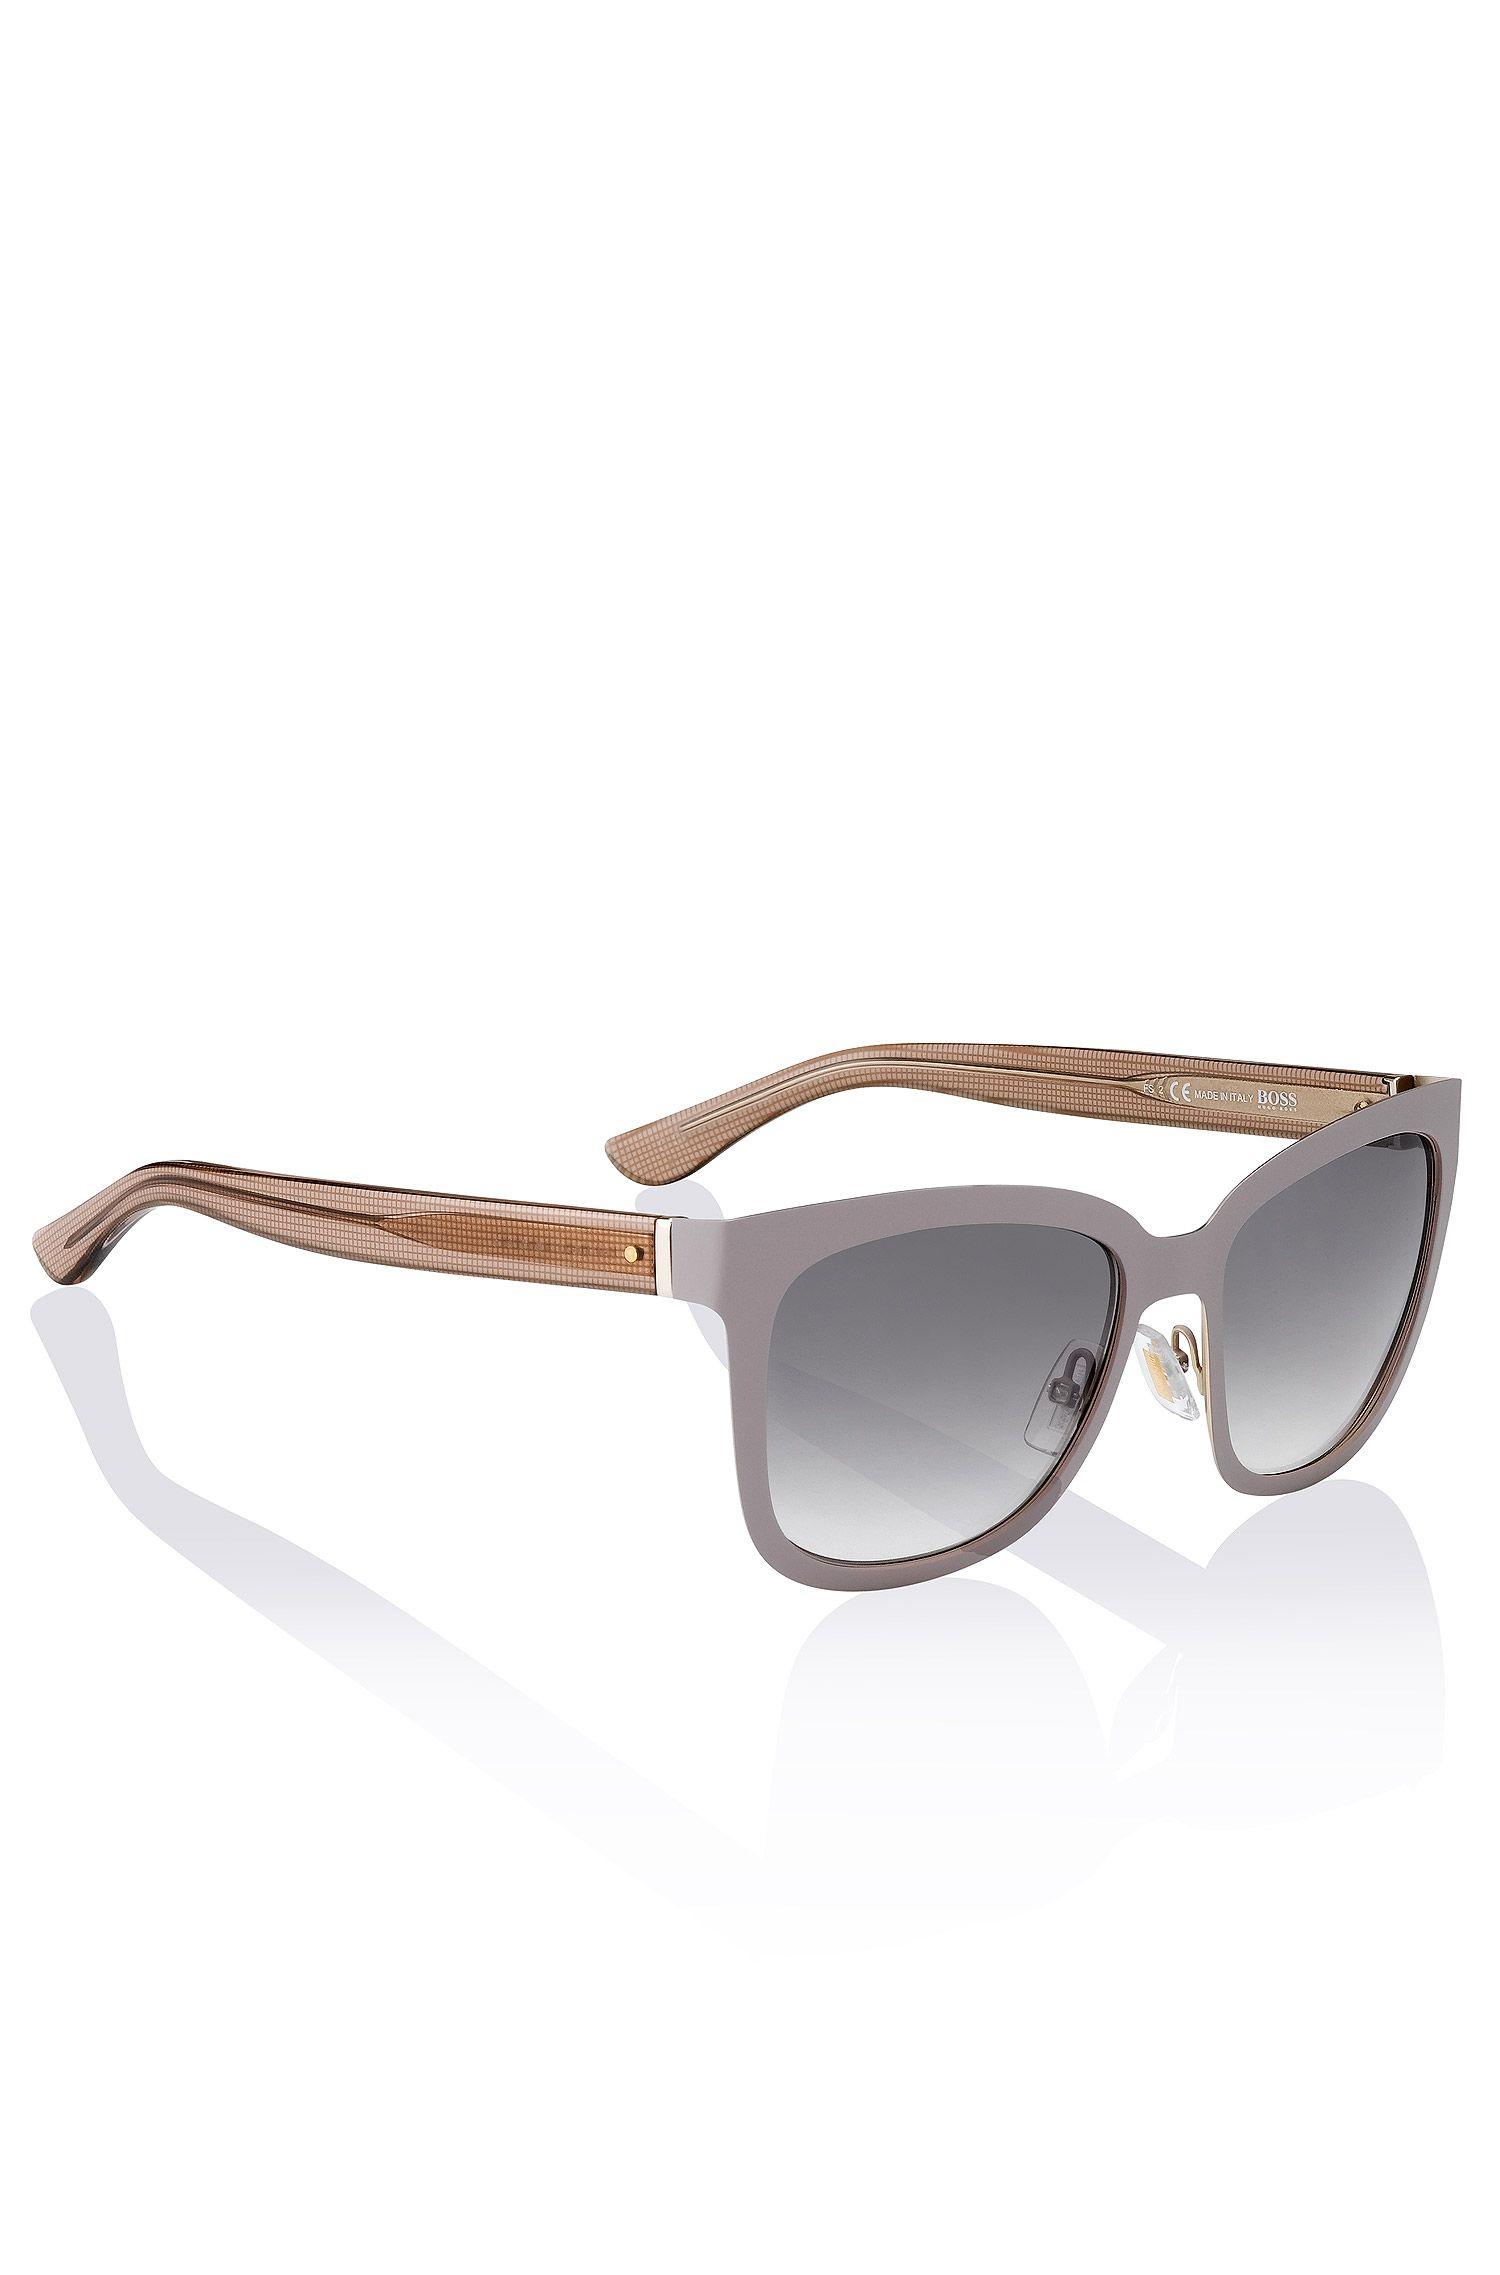 'BOSS 0676' acetate sunglasses